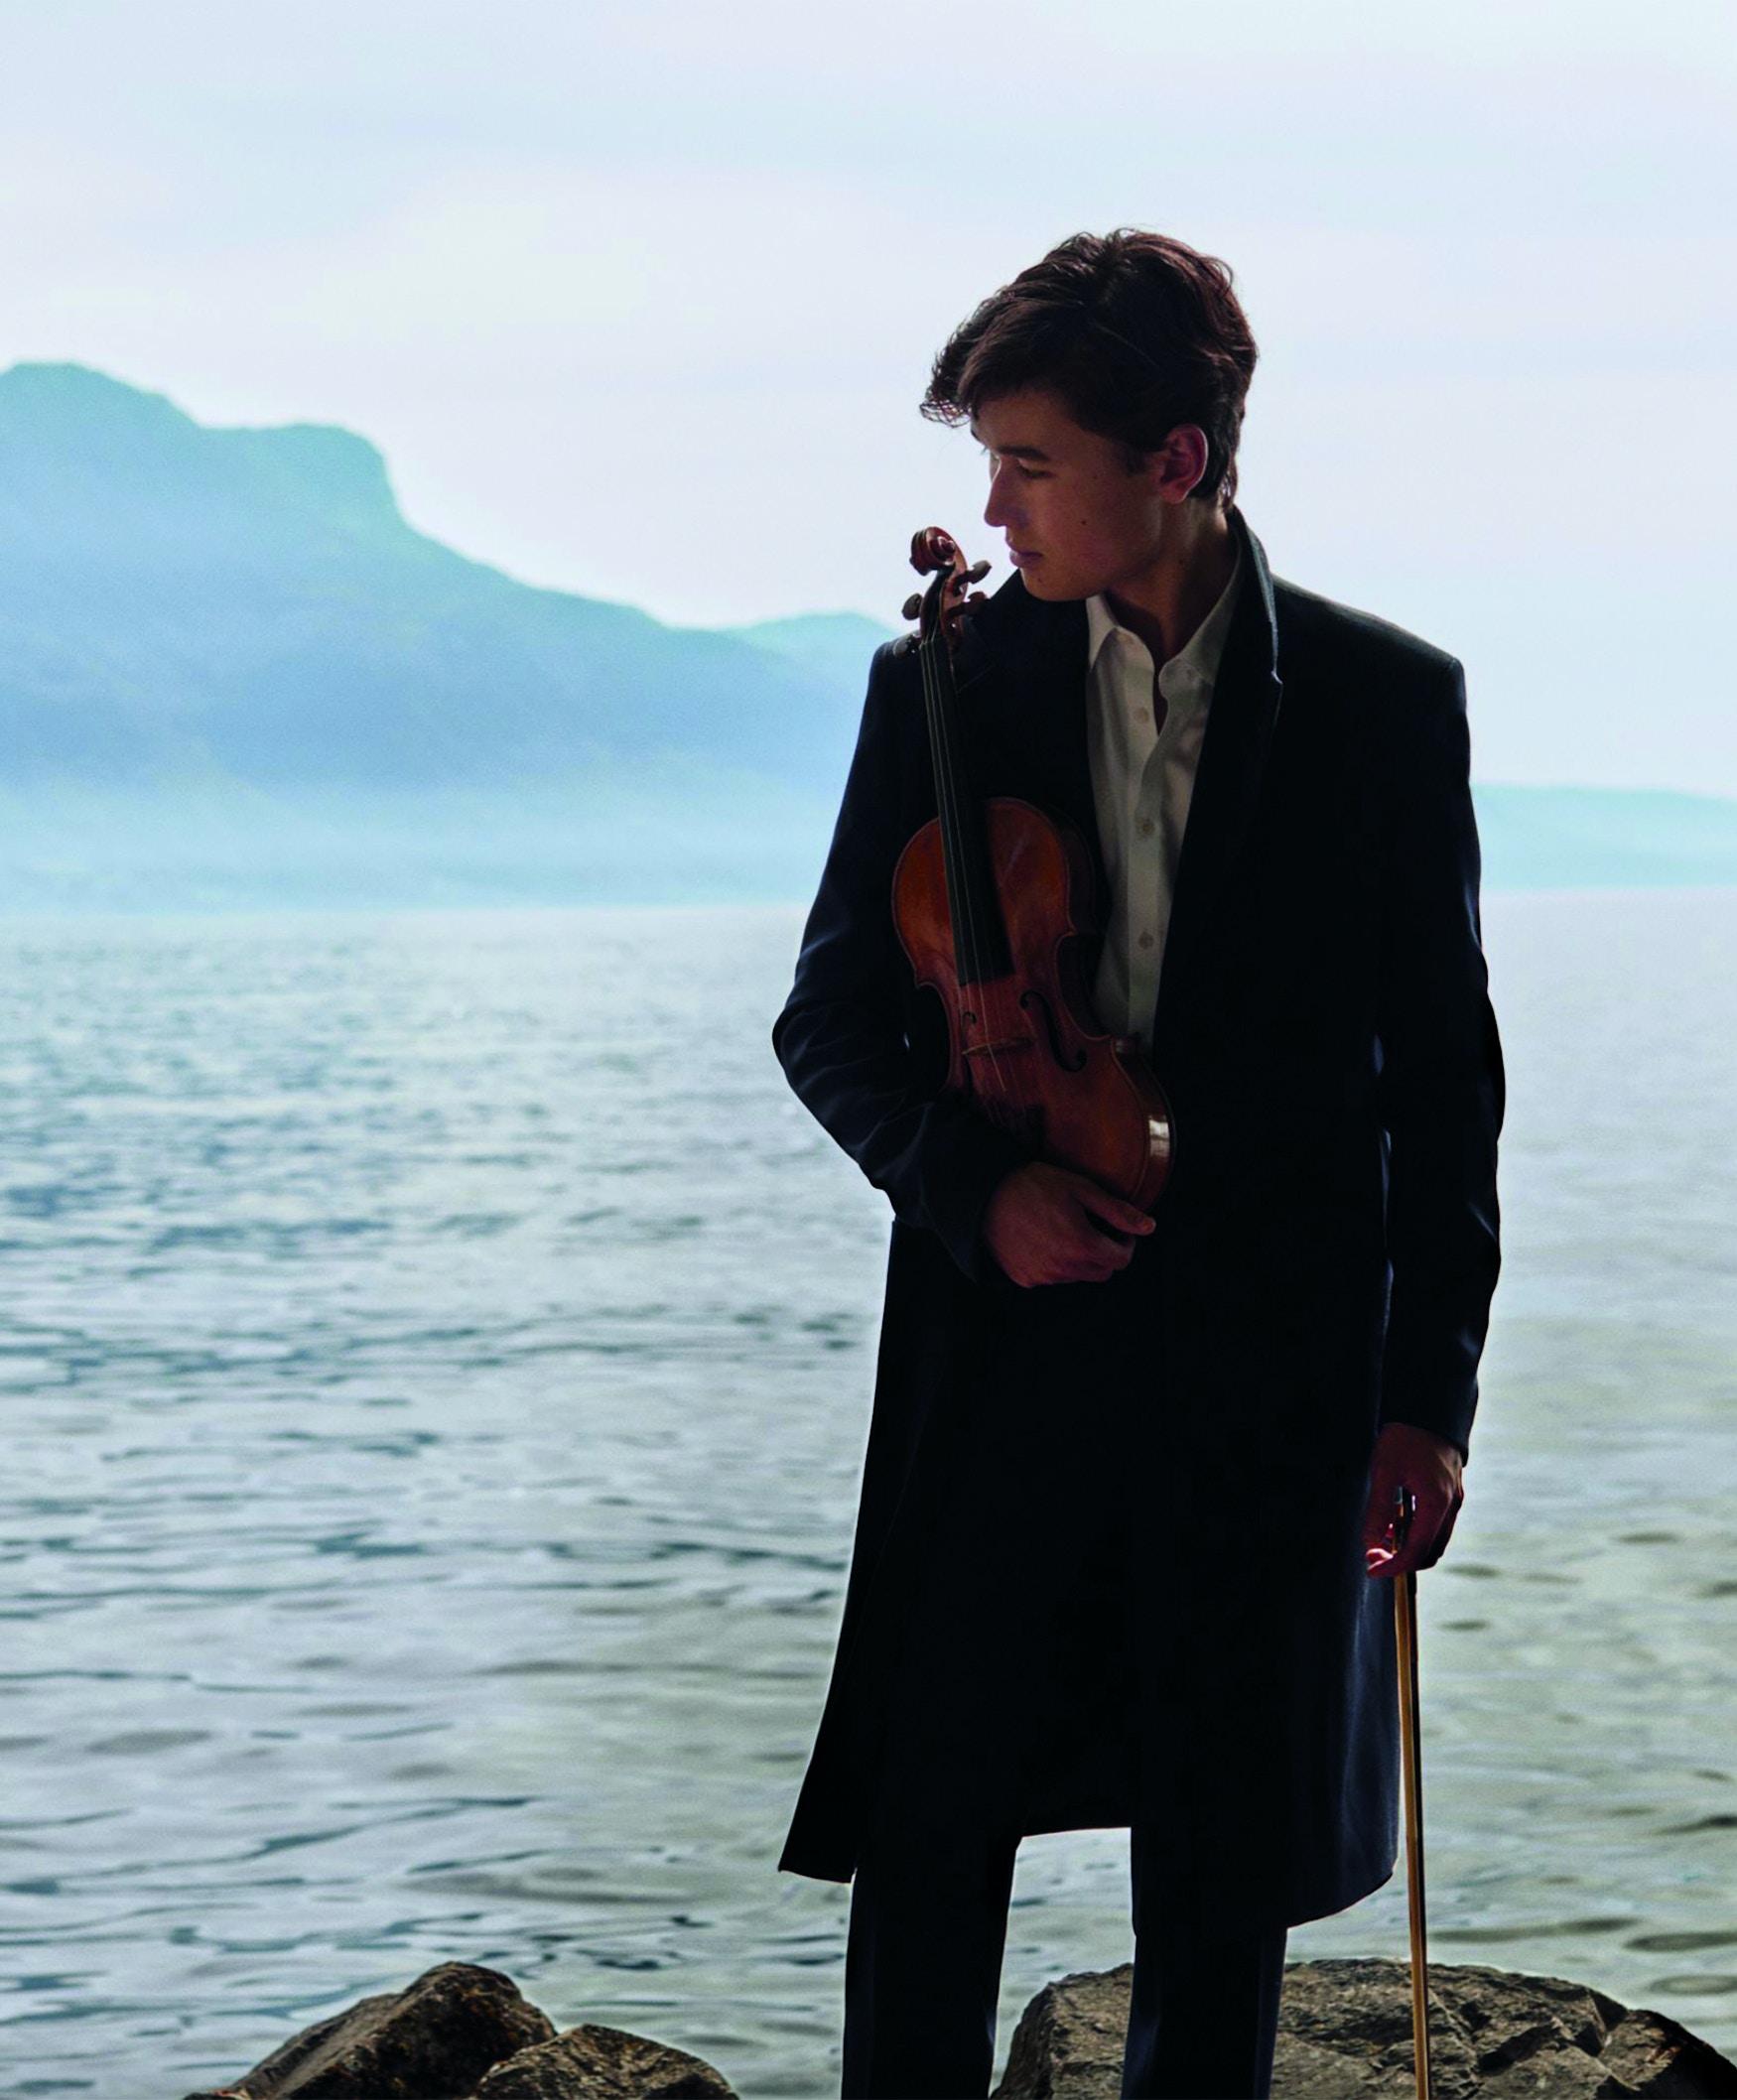 Fiolinist Daniel Lozakovitch